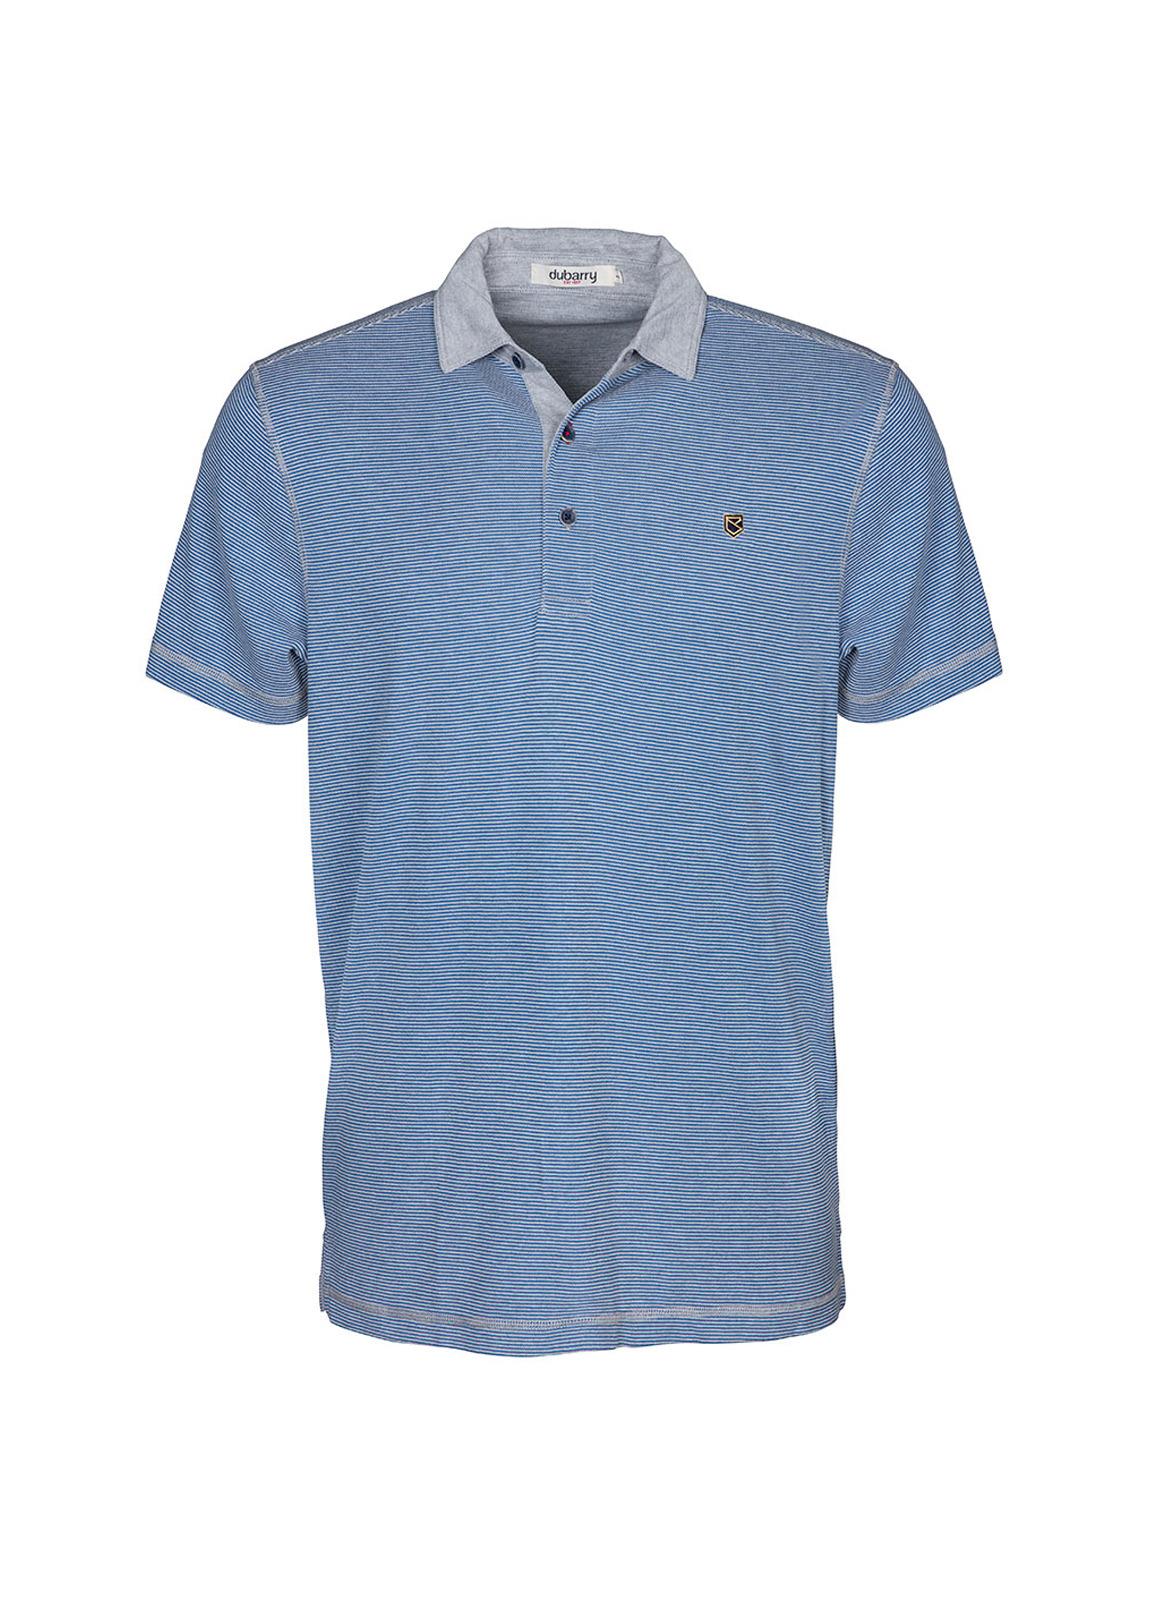 Dubarry_ Drumcliff Polo Shirt - Denim_Image_2